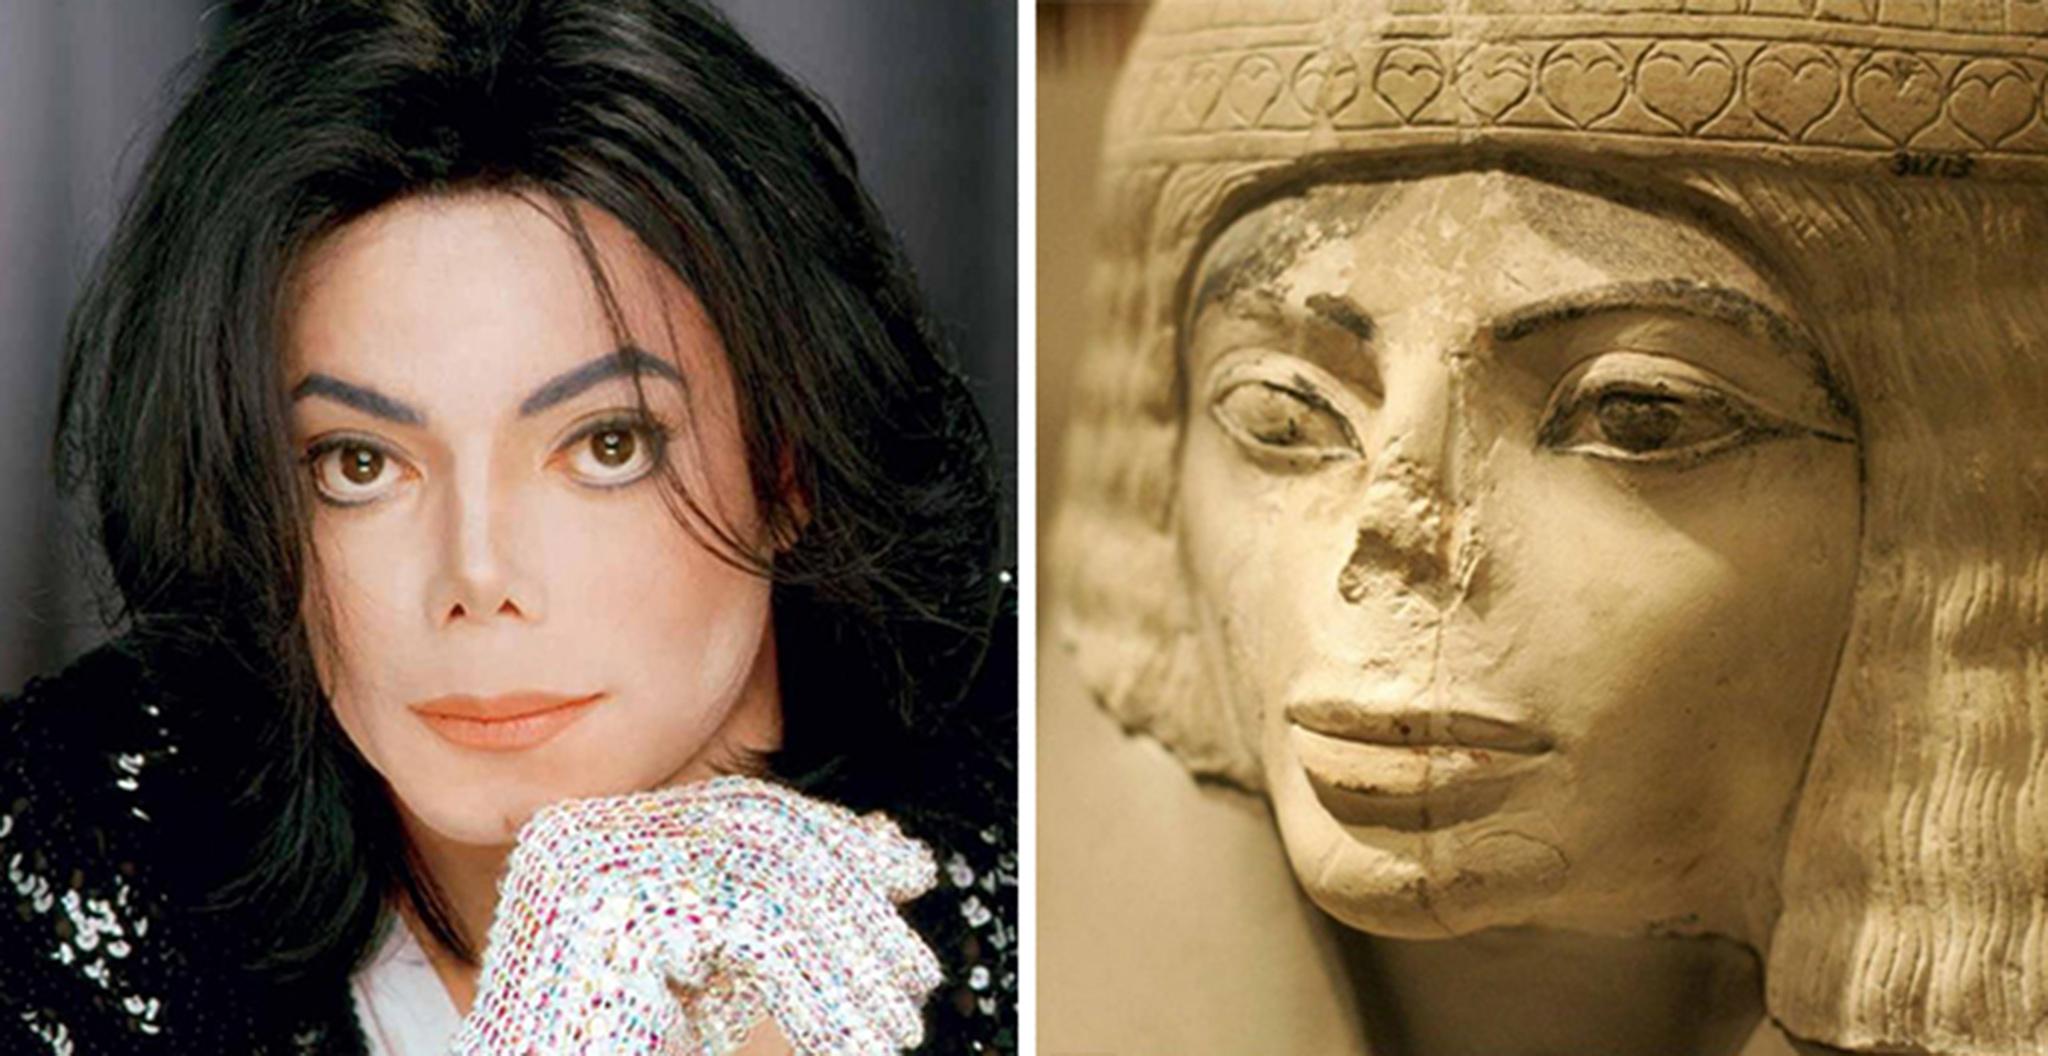 2 Michael Jackson Looks Like This Egyptian Statue